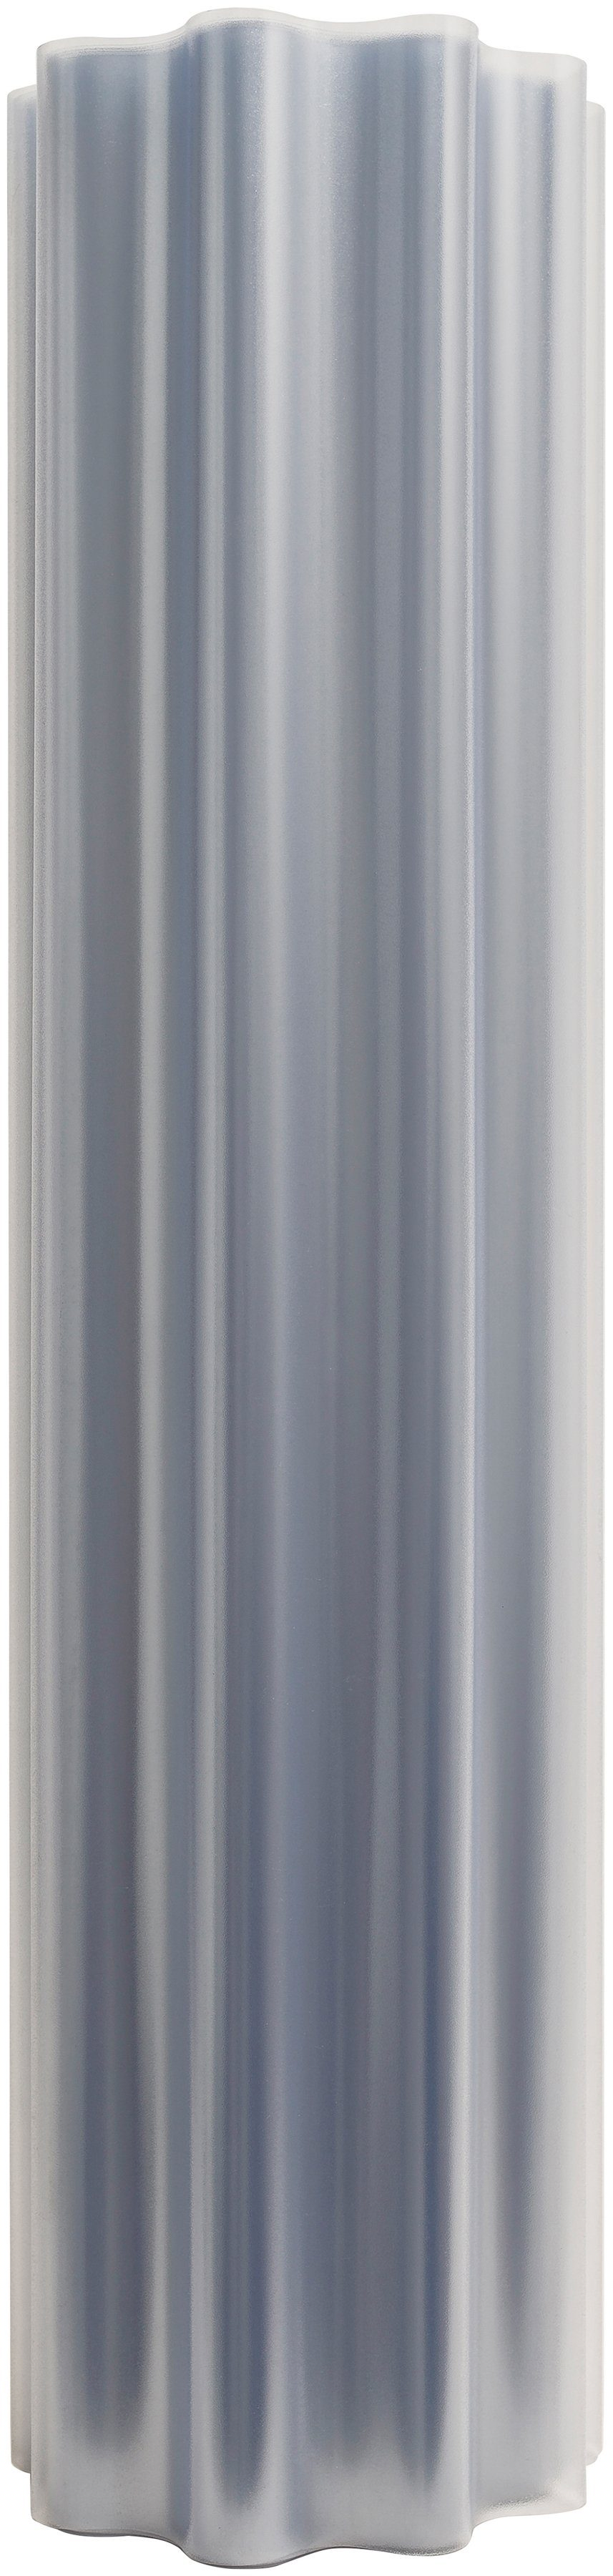 Wellplatte »Rolle sinus«, klar, 20 m², inkl. Befestigung